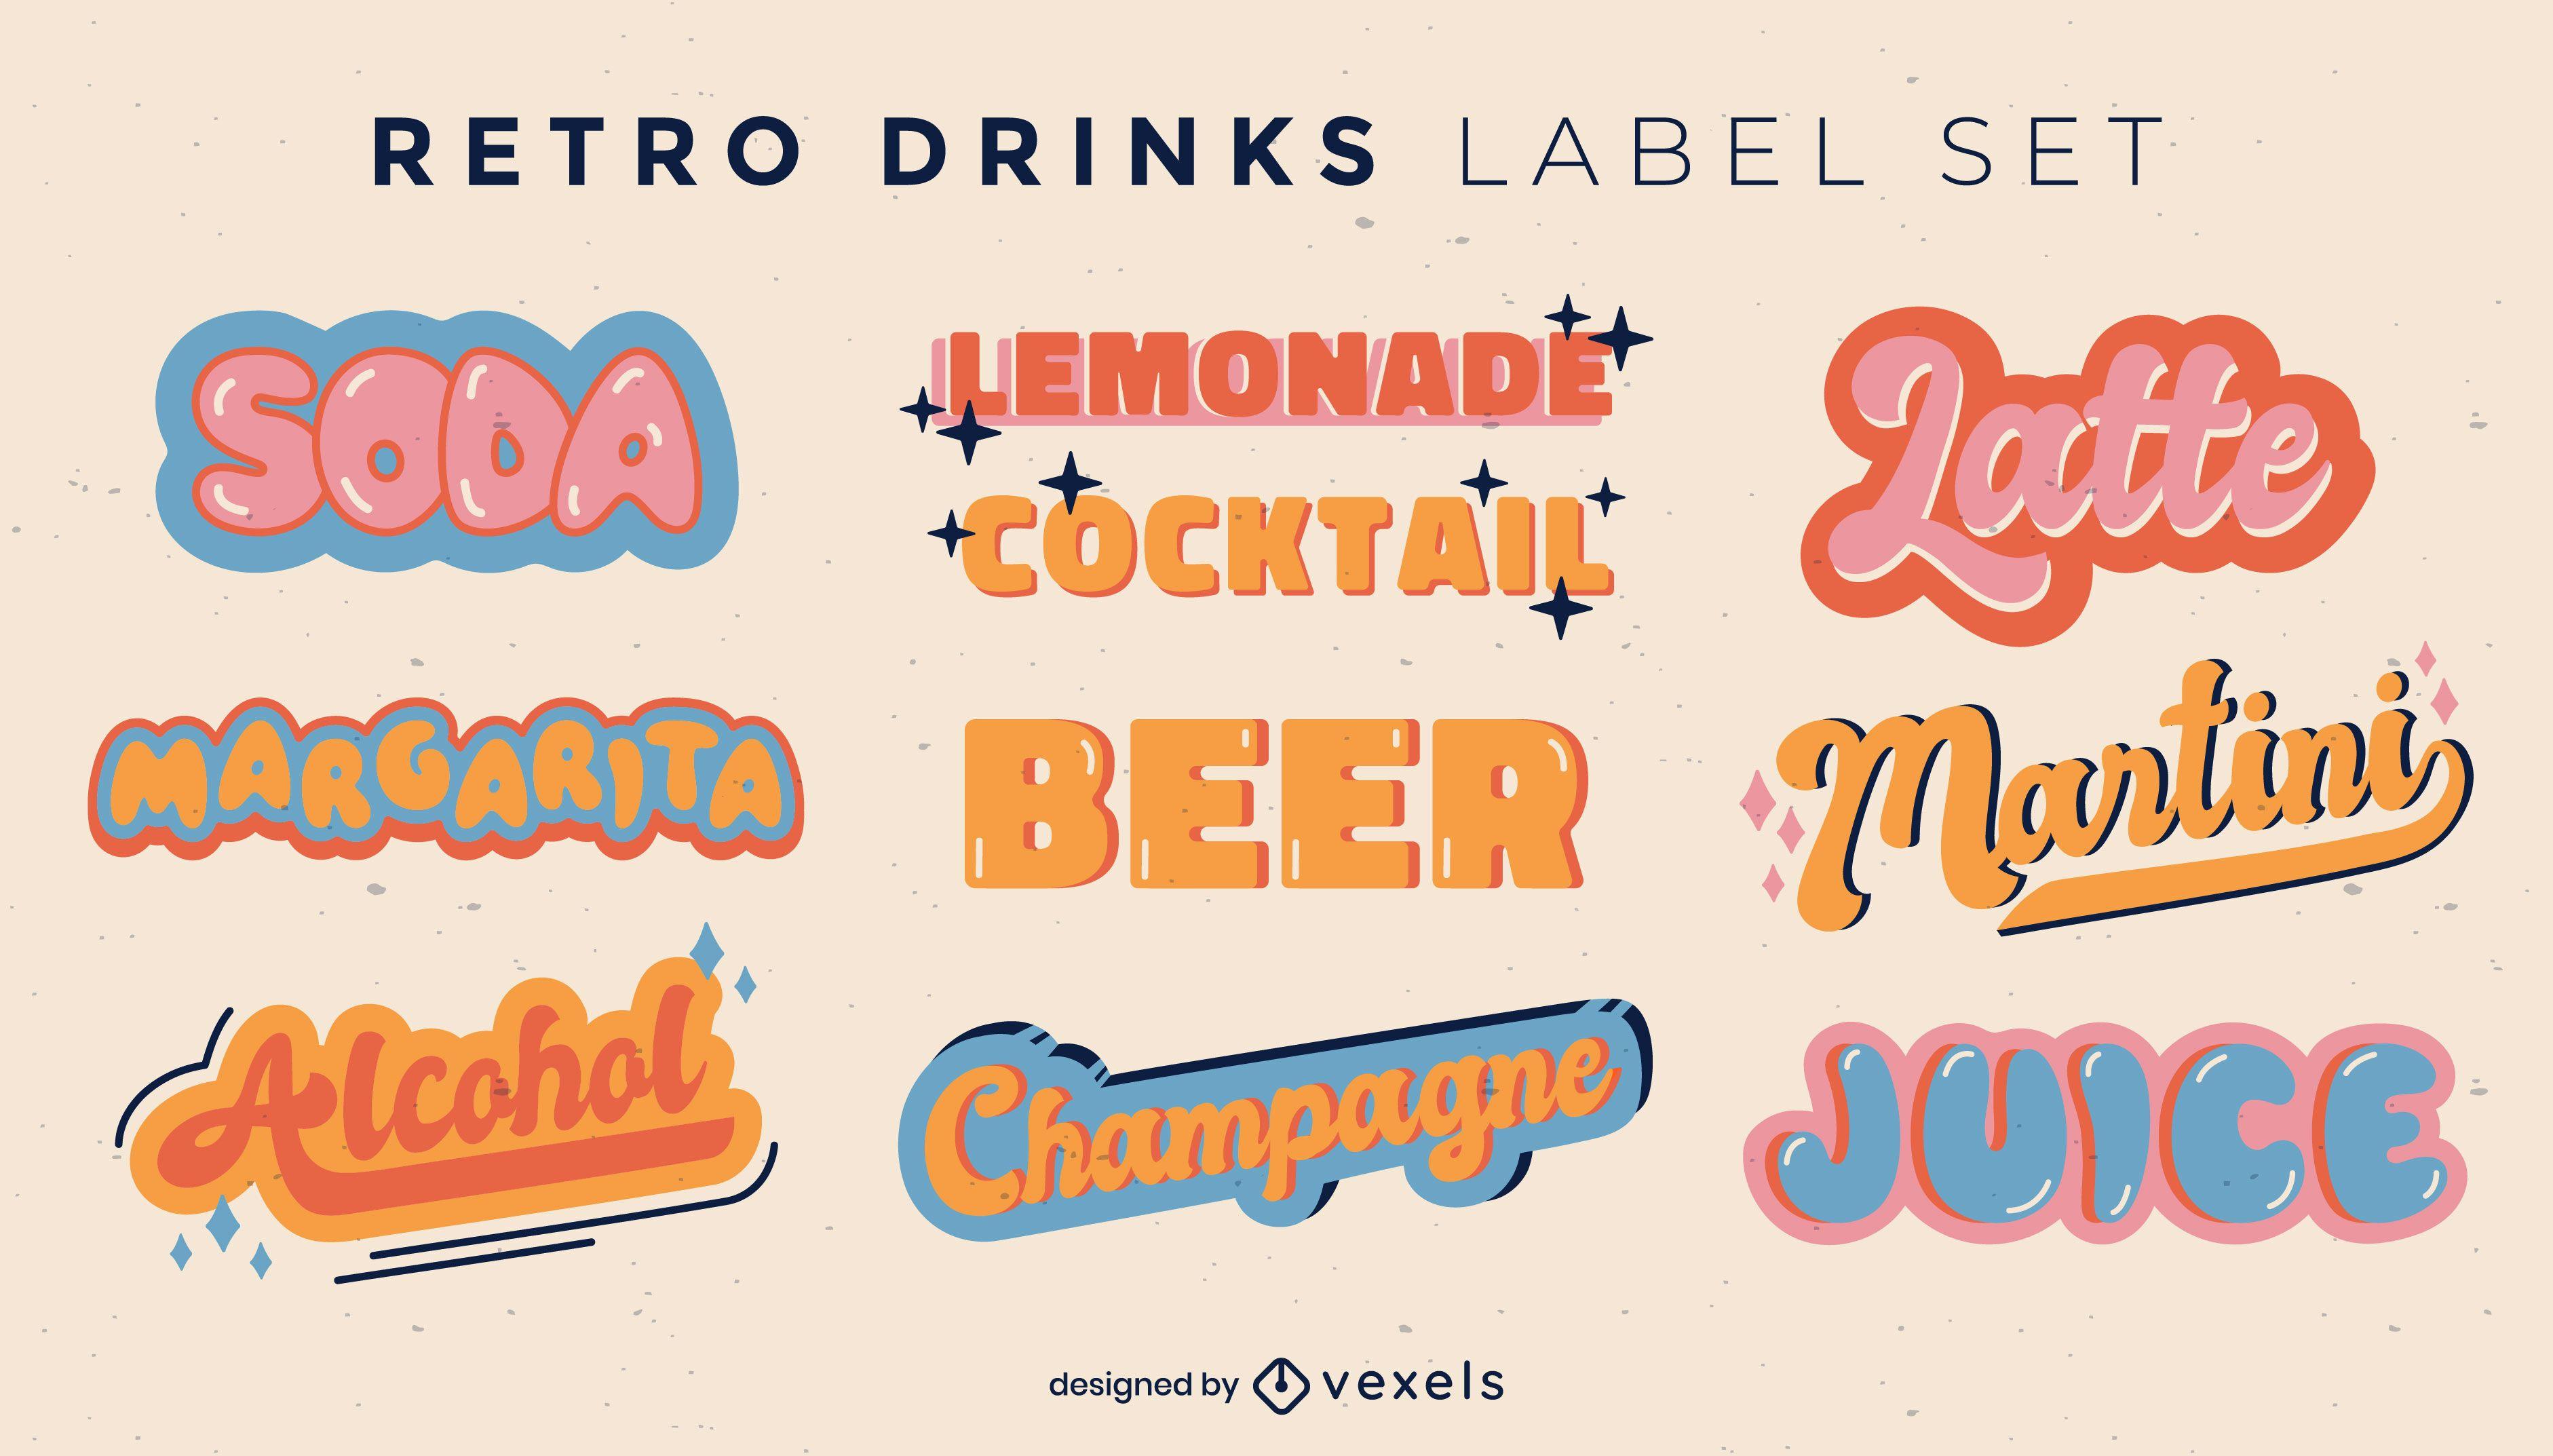 Drink labels retro lettering style set